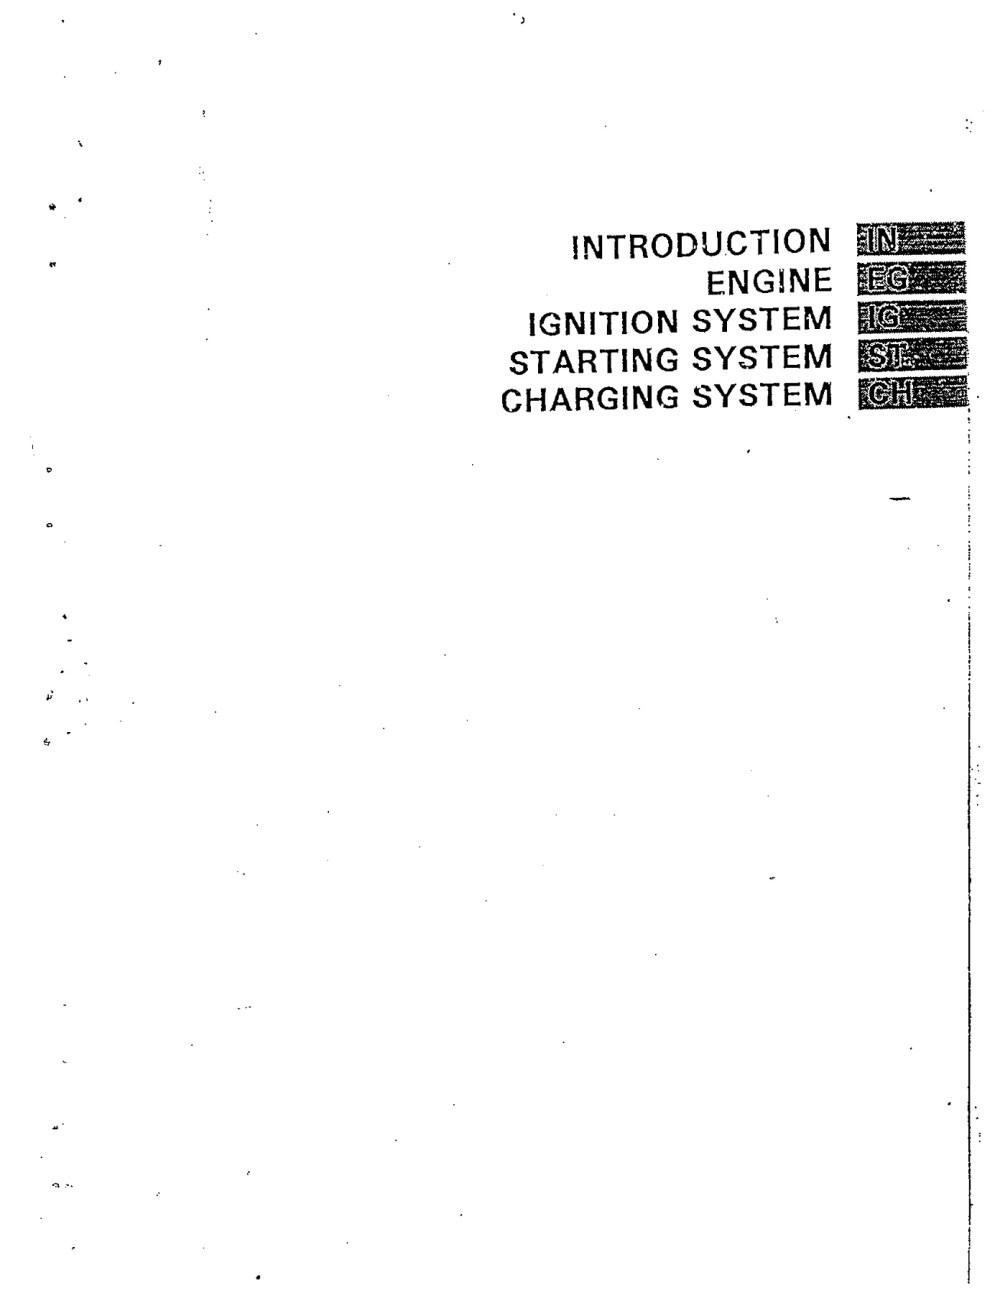 medium resolution of kijang 7k engine repair book pages 1 50 text version anyflip rh anyflip com modified toyota toyota gr engine